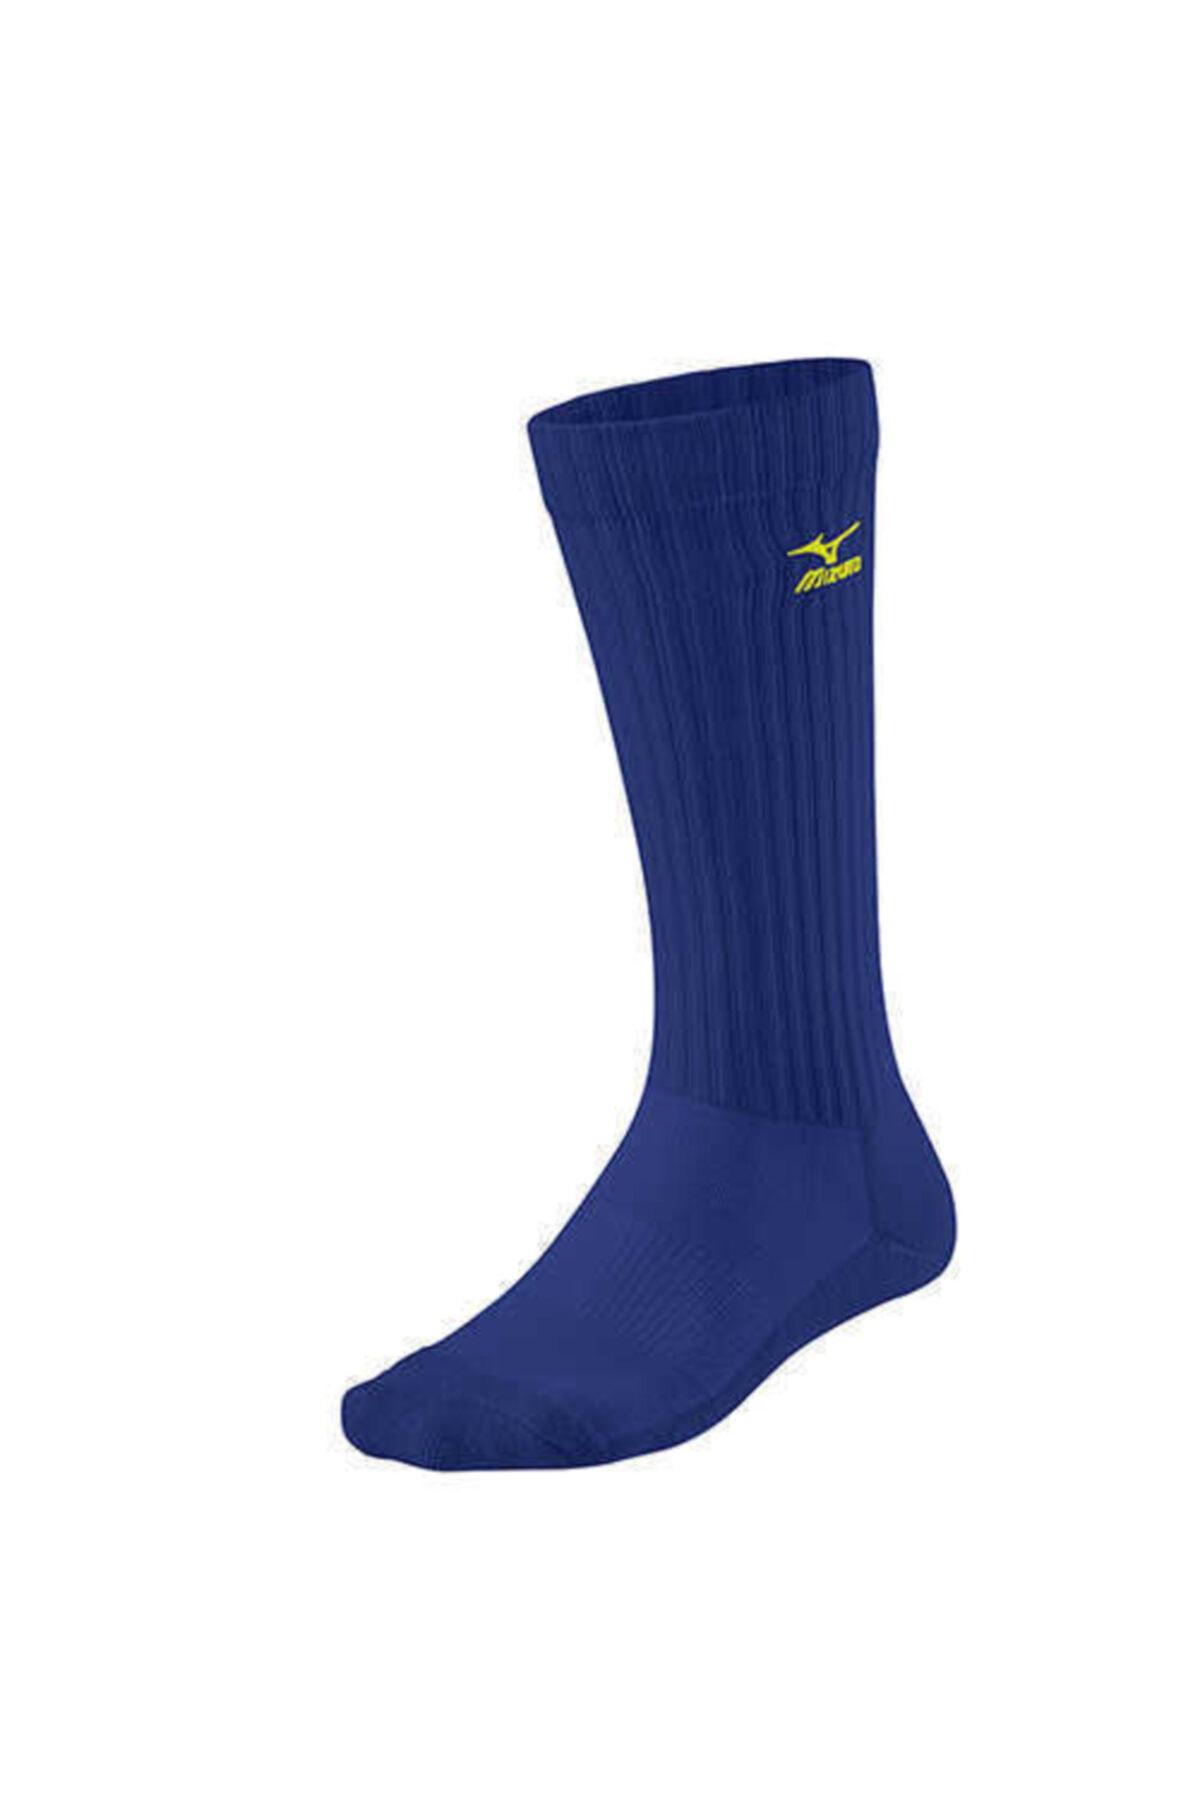 MIZUNO Volley Socks Long Unisex Çorap Mavi 1